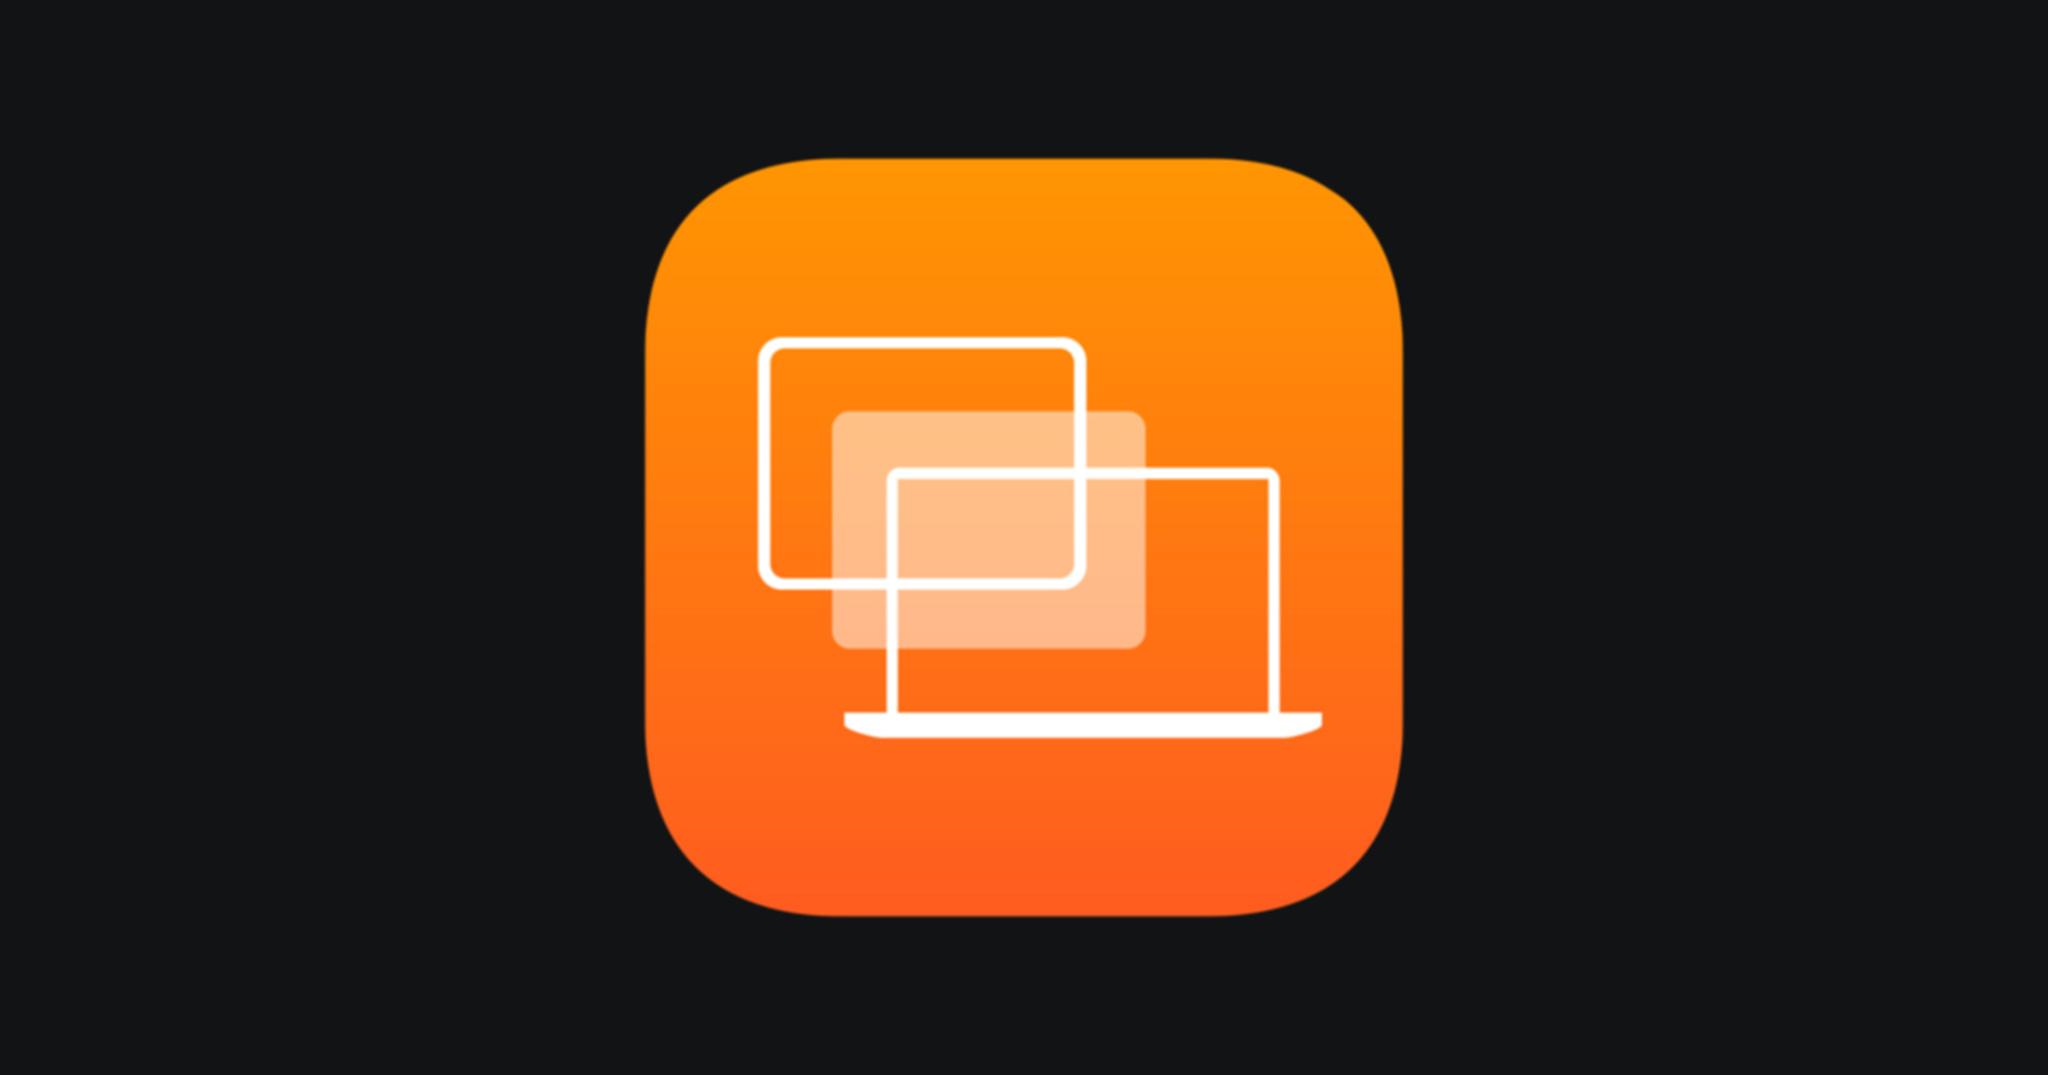 Mac catalyst logo